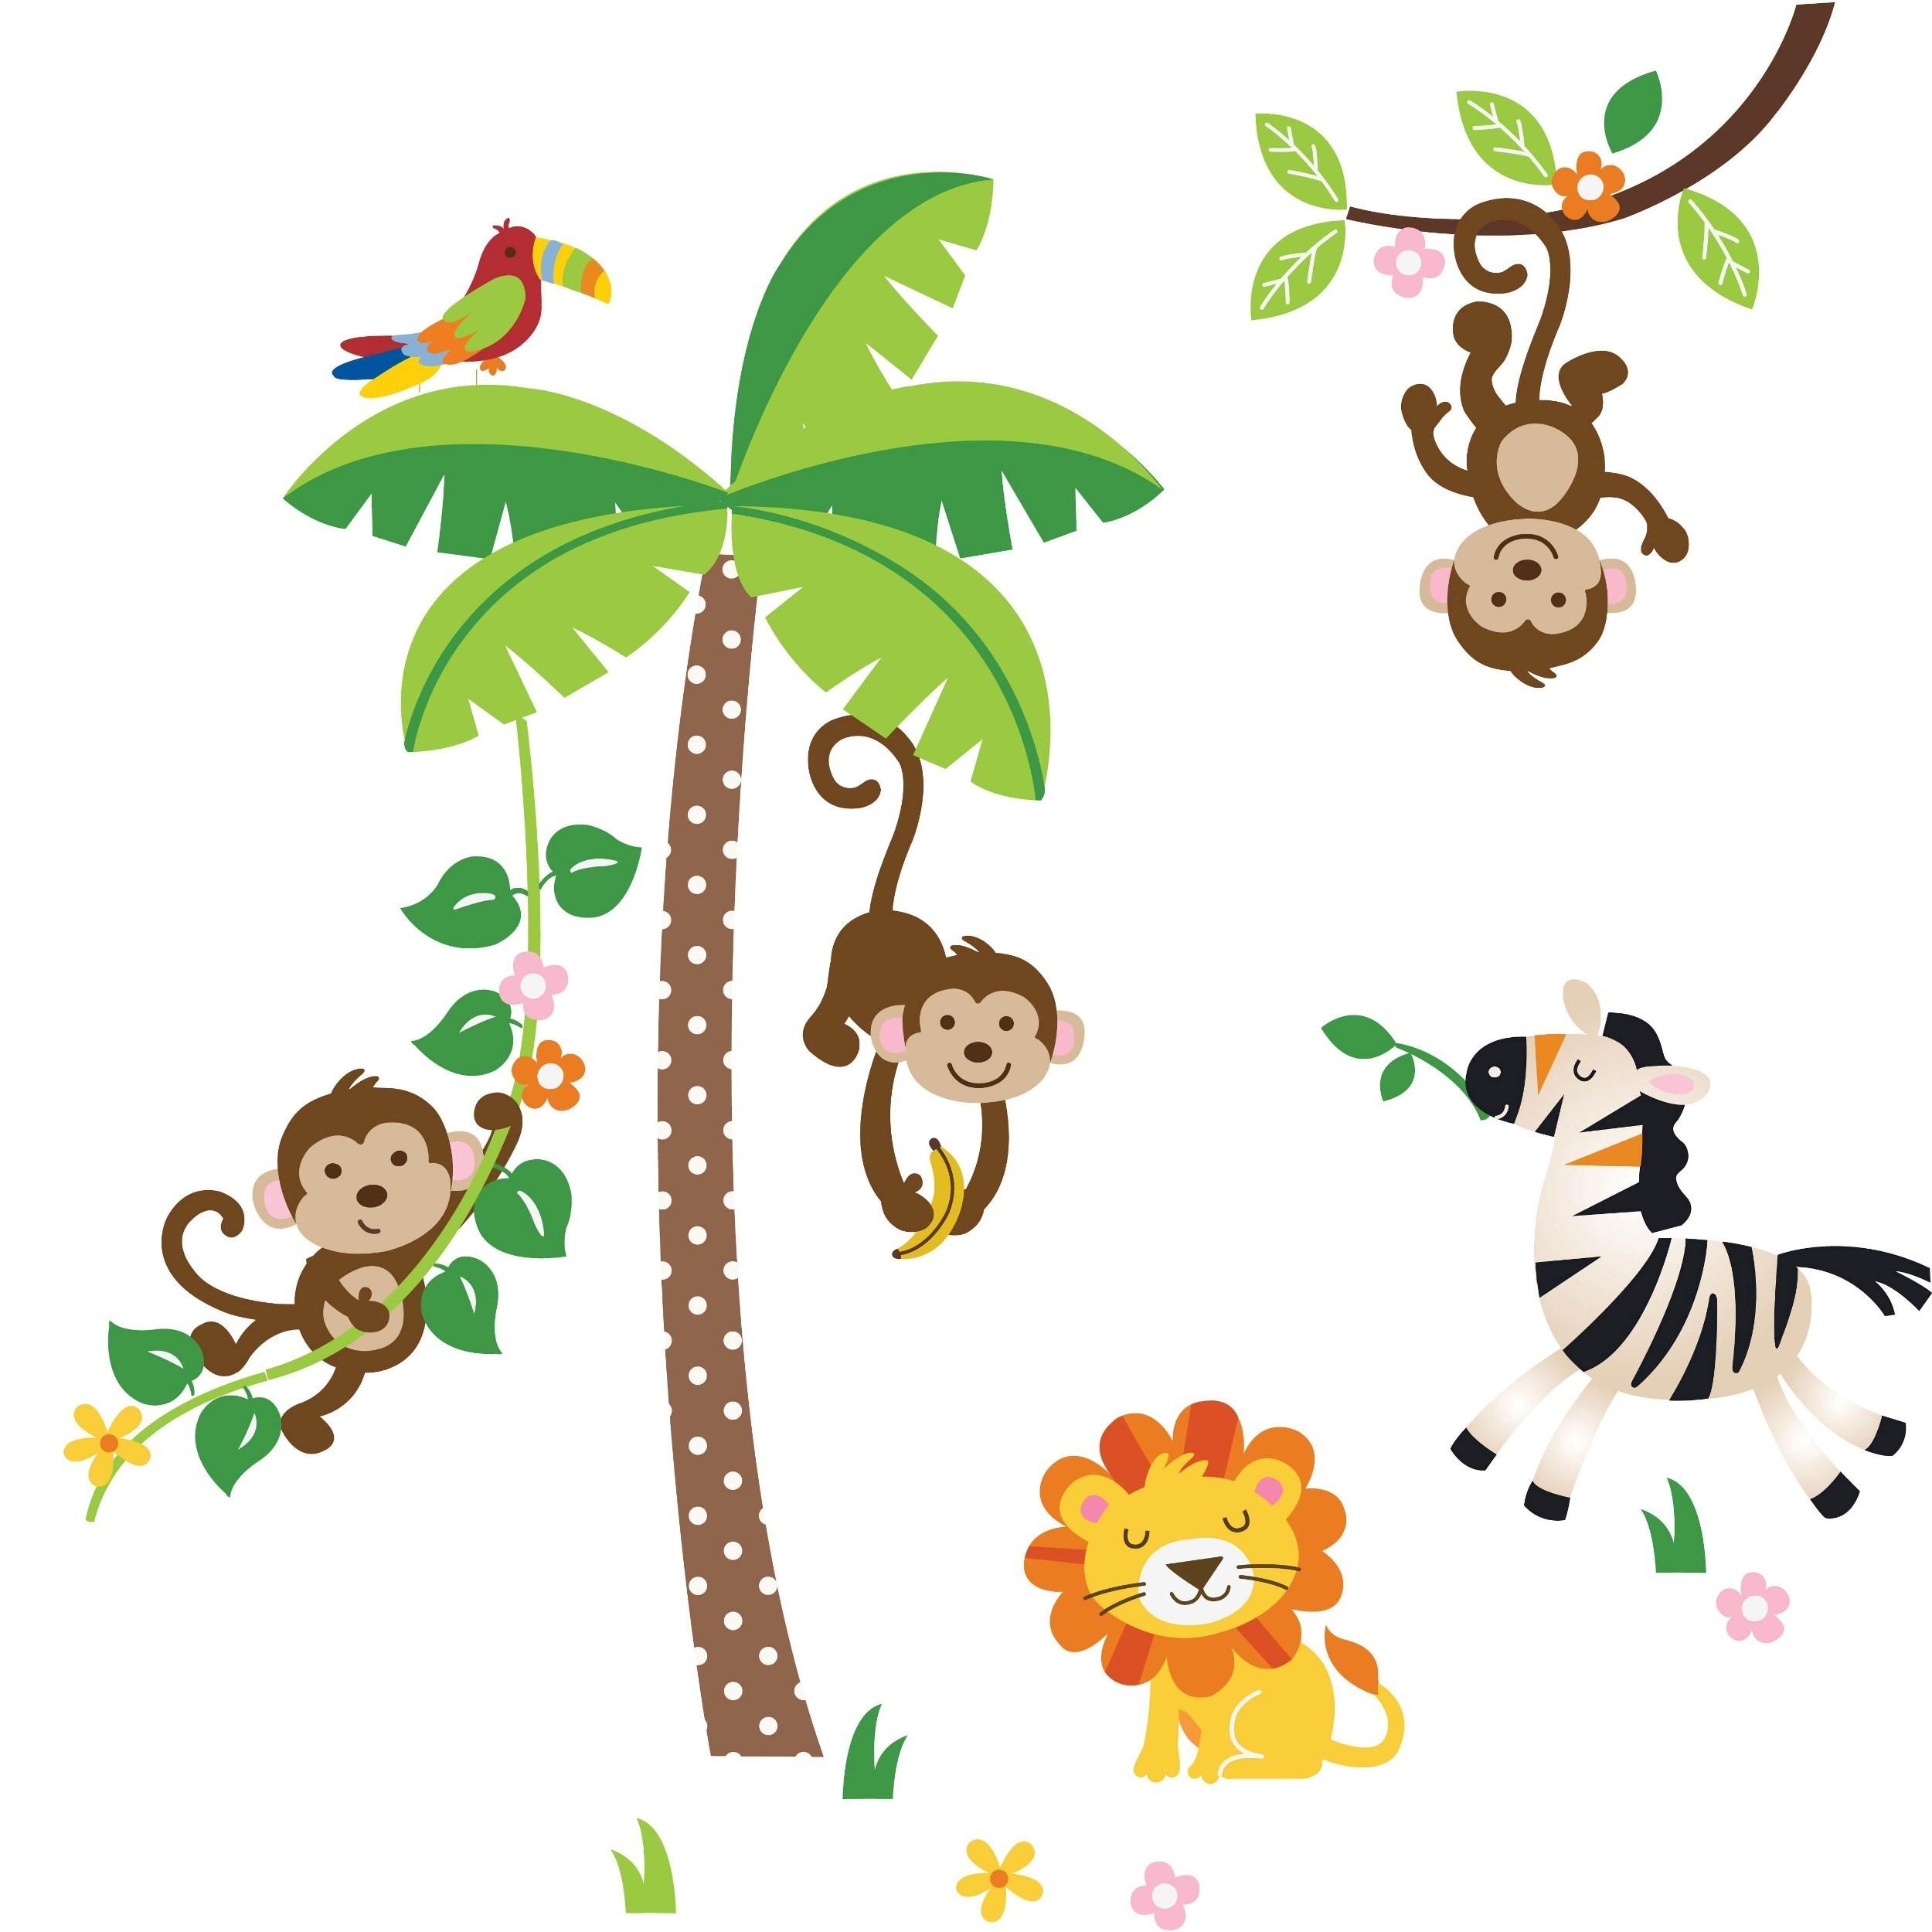 Peel & Stick Giant Jungle Monkeys Wall Decal - Overstock ...